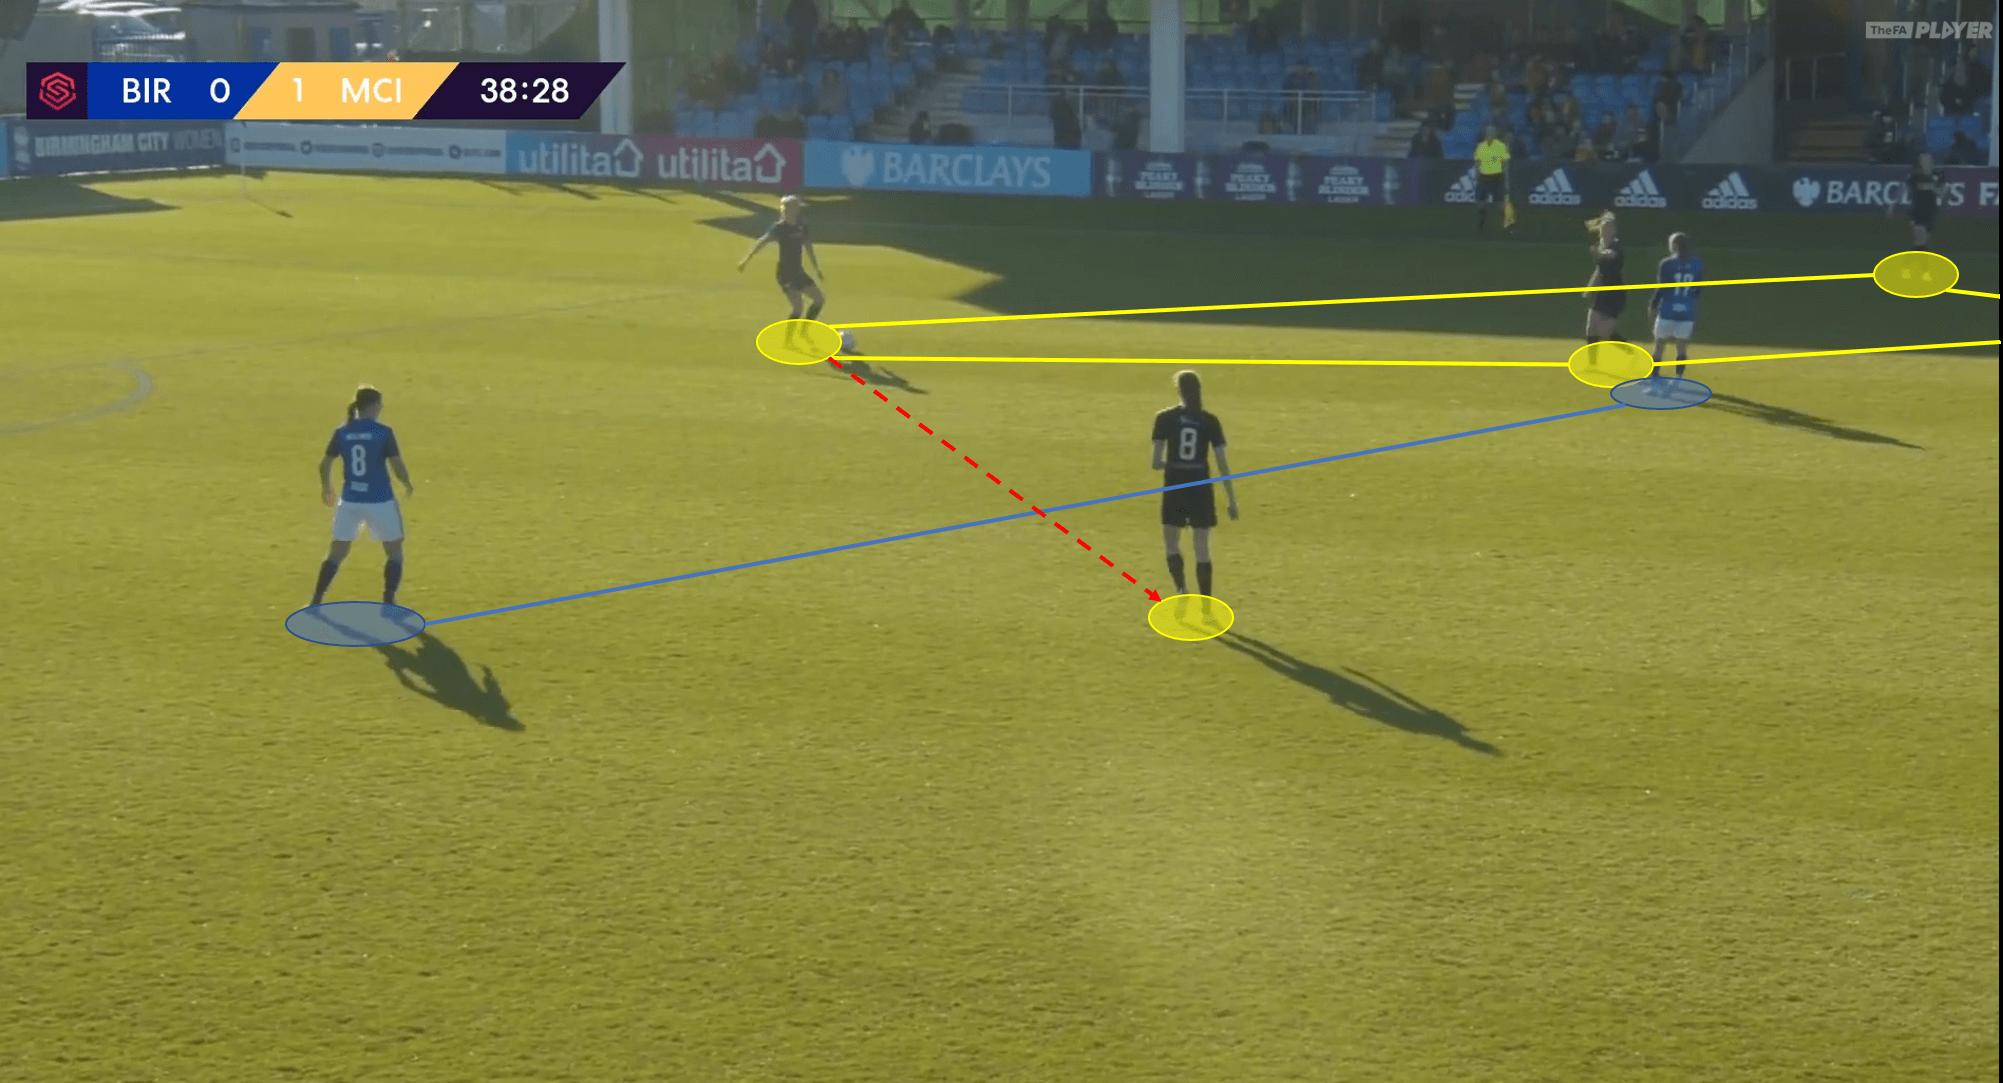 FAWSL 2019/20: Birmingham City LFC vs Manchester City Women - tactical analysis tactics